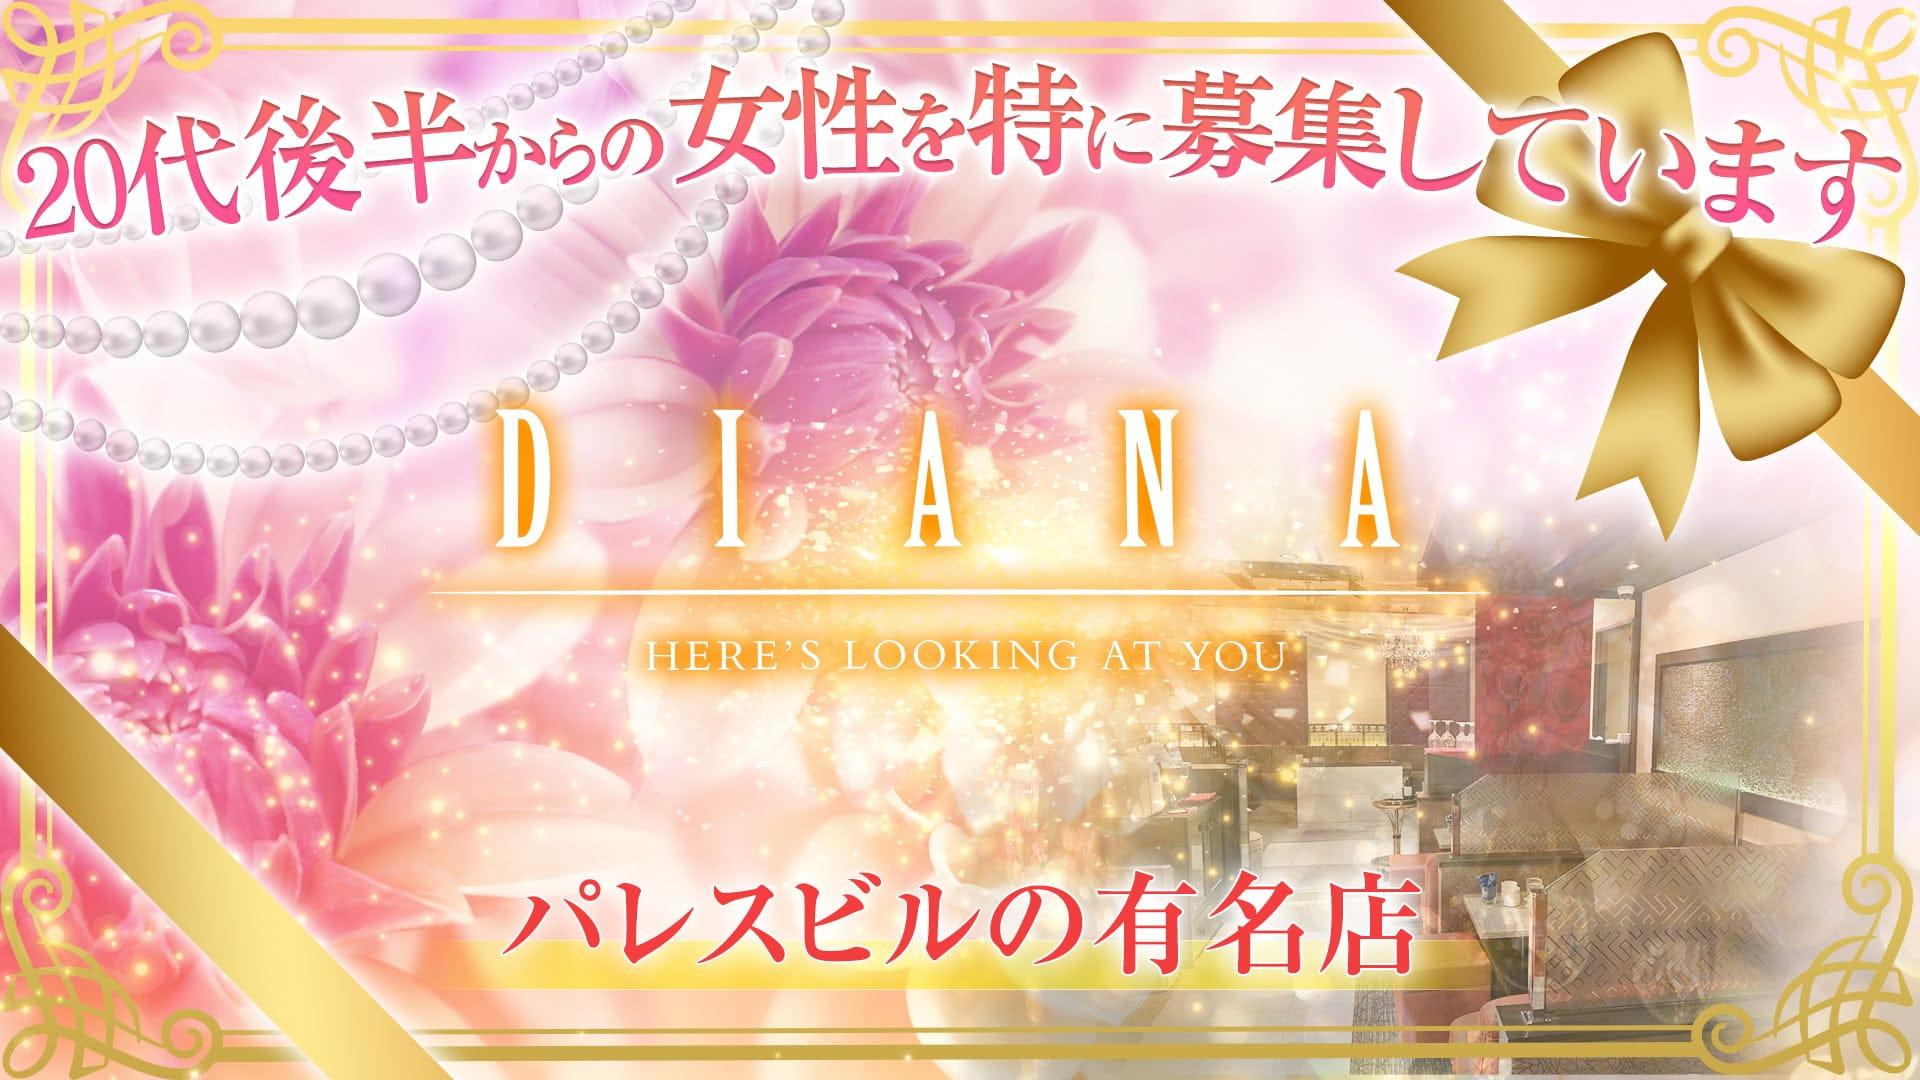 DIANA(ダイアナ)【公式求人・体入情報】 静岡キャバクラ TOP画像